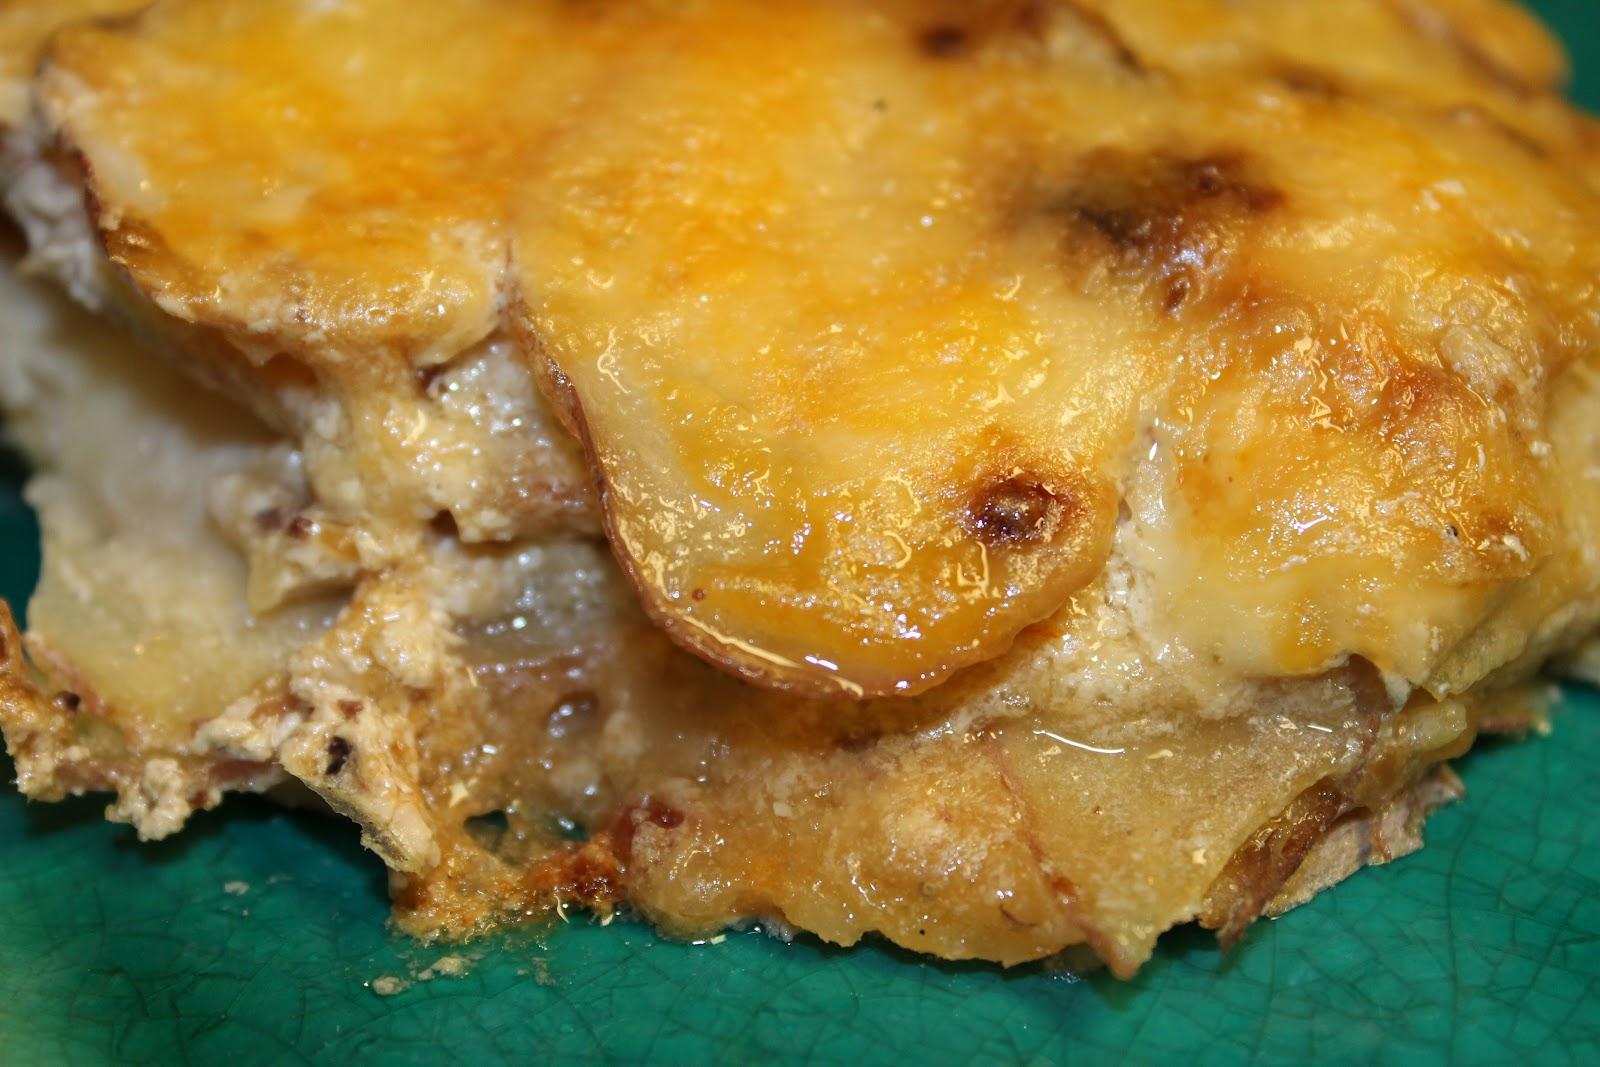 Gluten Free Casually: Scalloped Potatoes